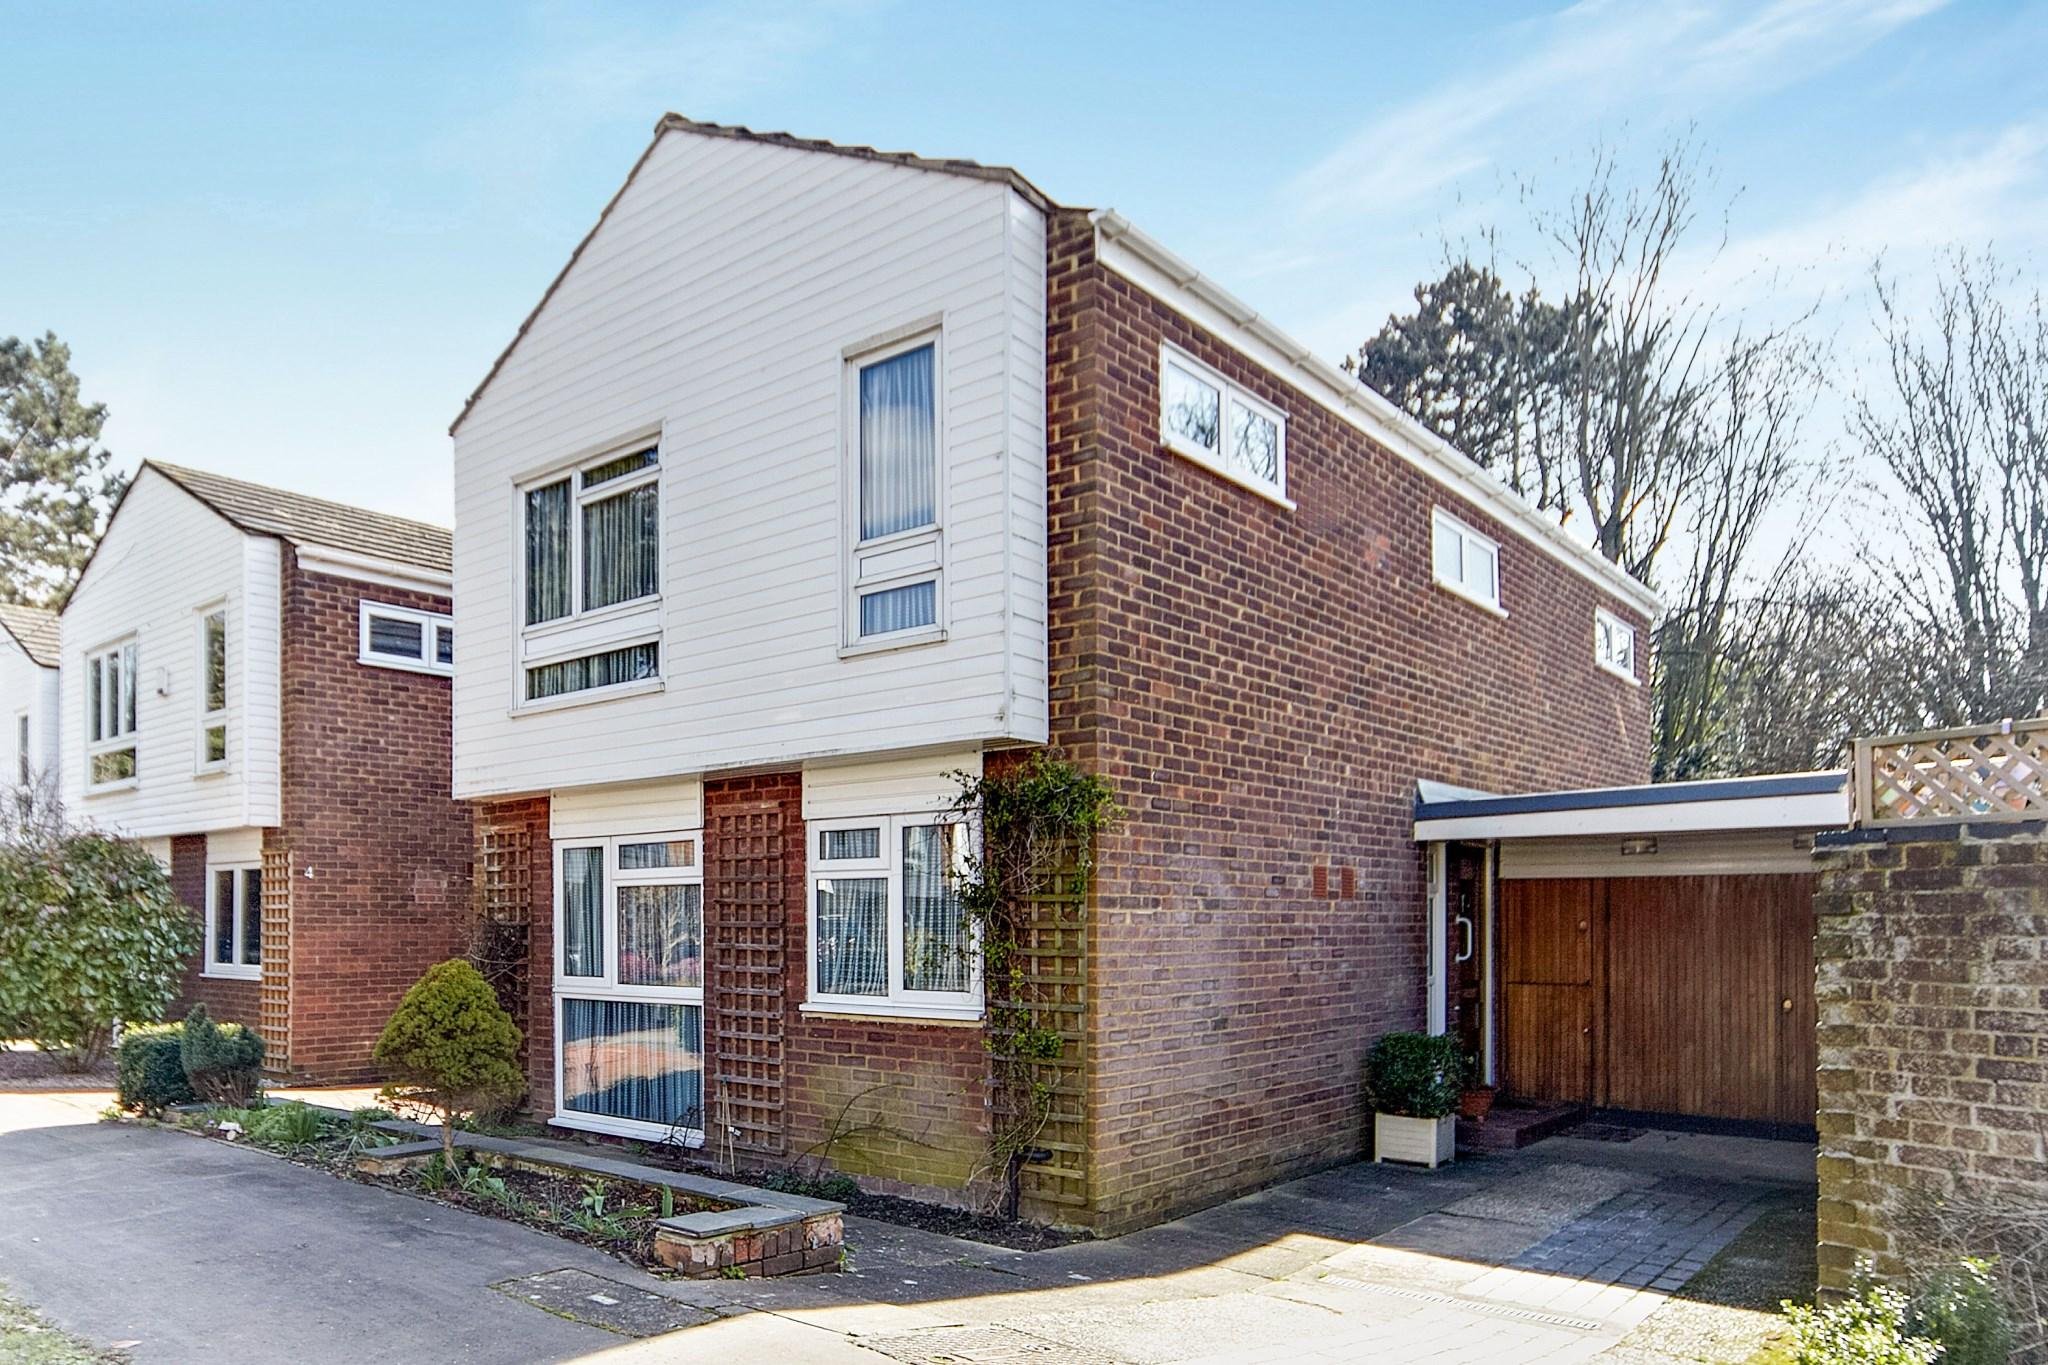 Rushmead Close, Croydon, CR0